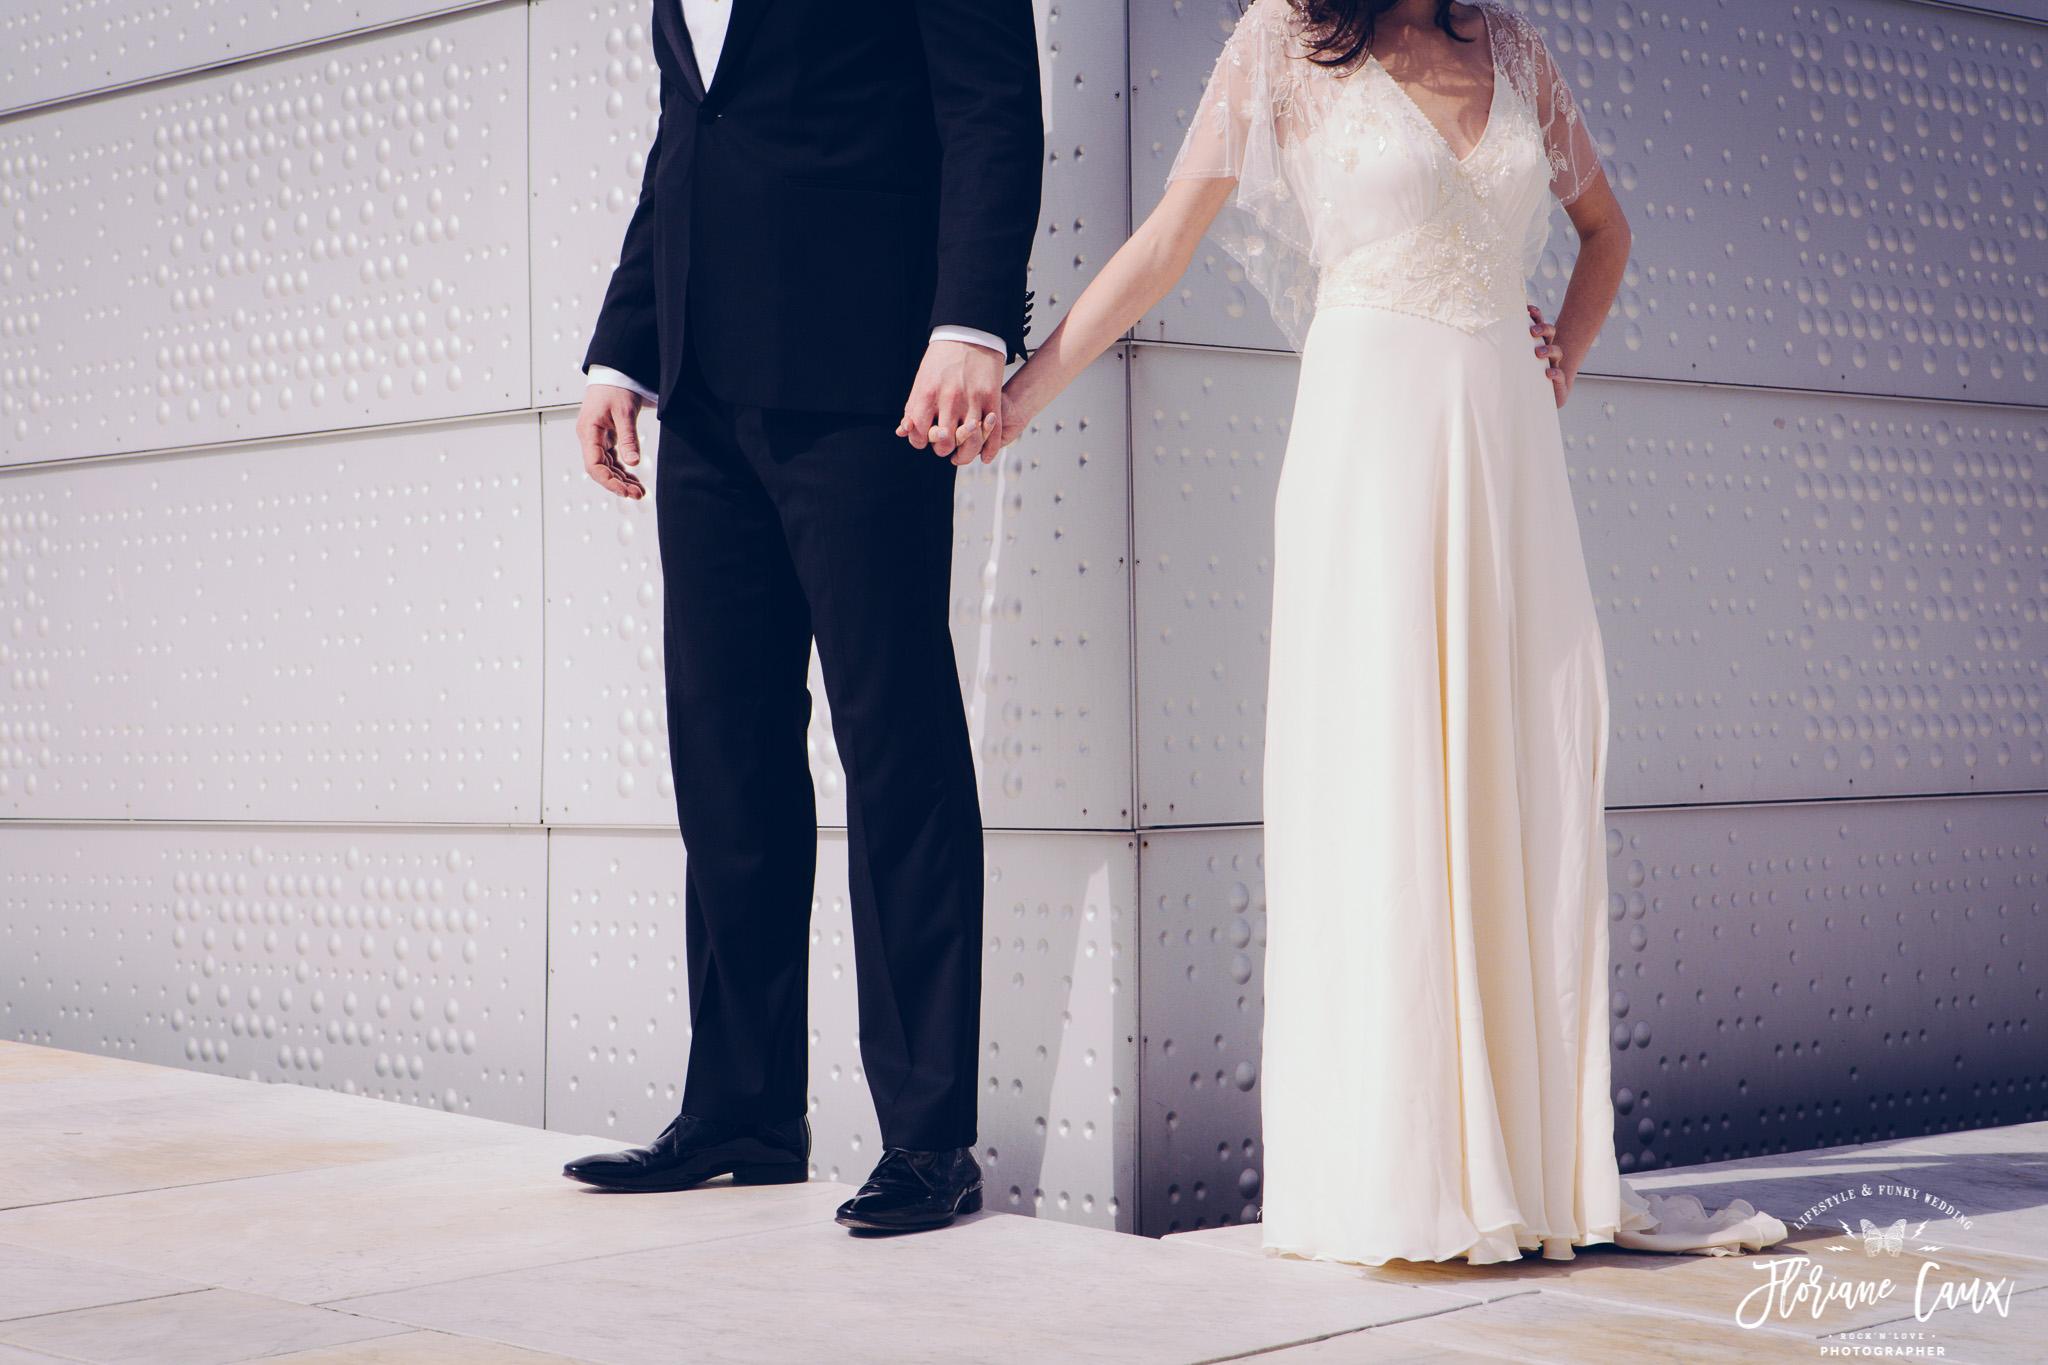 destination-wedding-photographer-oslo-norway-floriane-caux-68